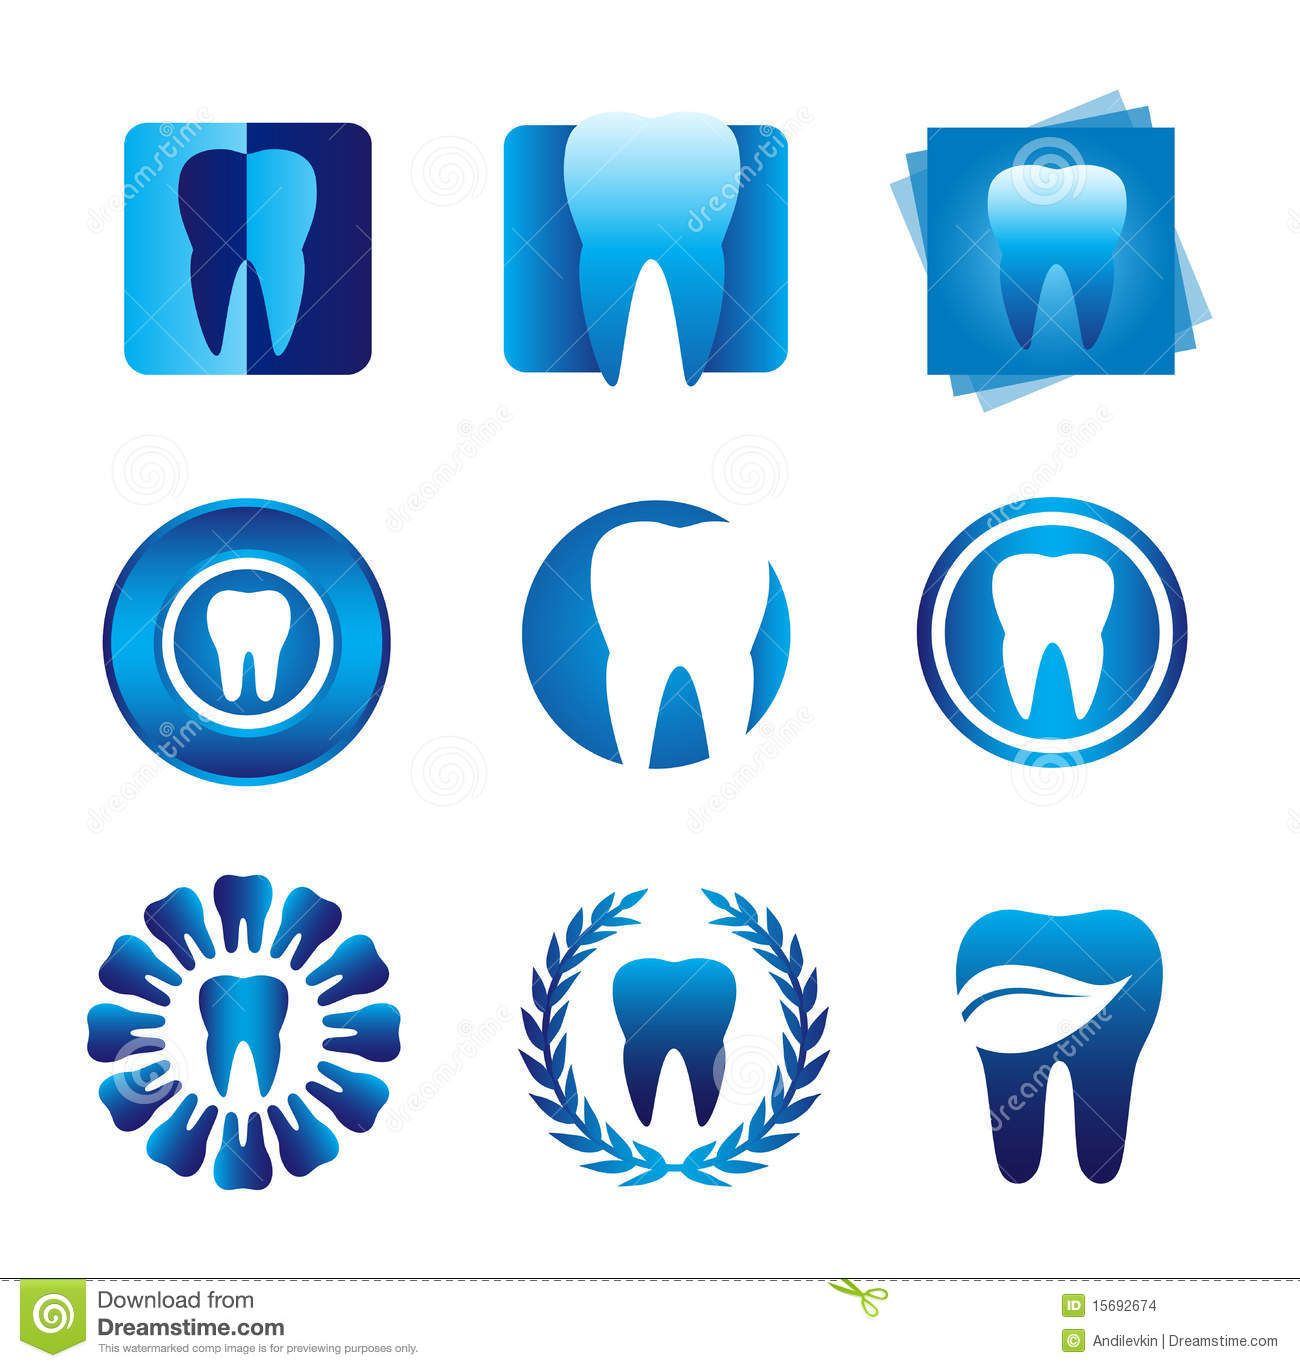 dental logo   Dental Logos   Pinterest   Dental logo, Dental and Logos